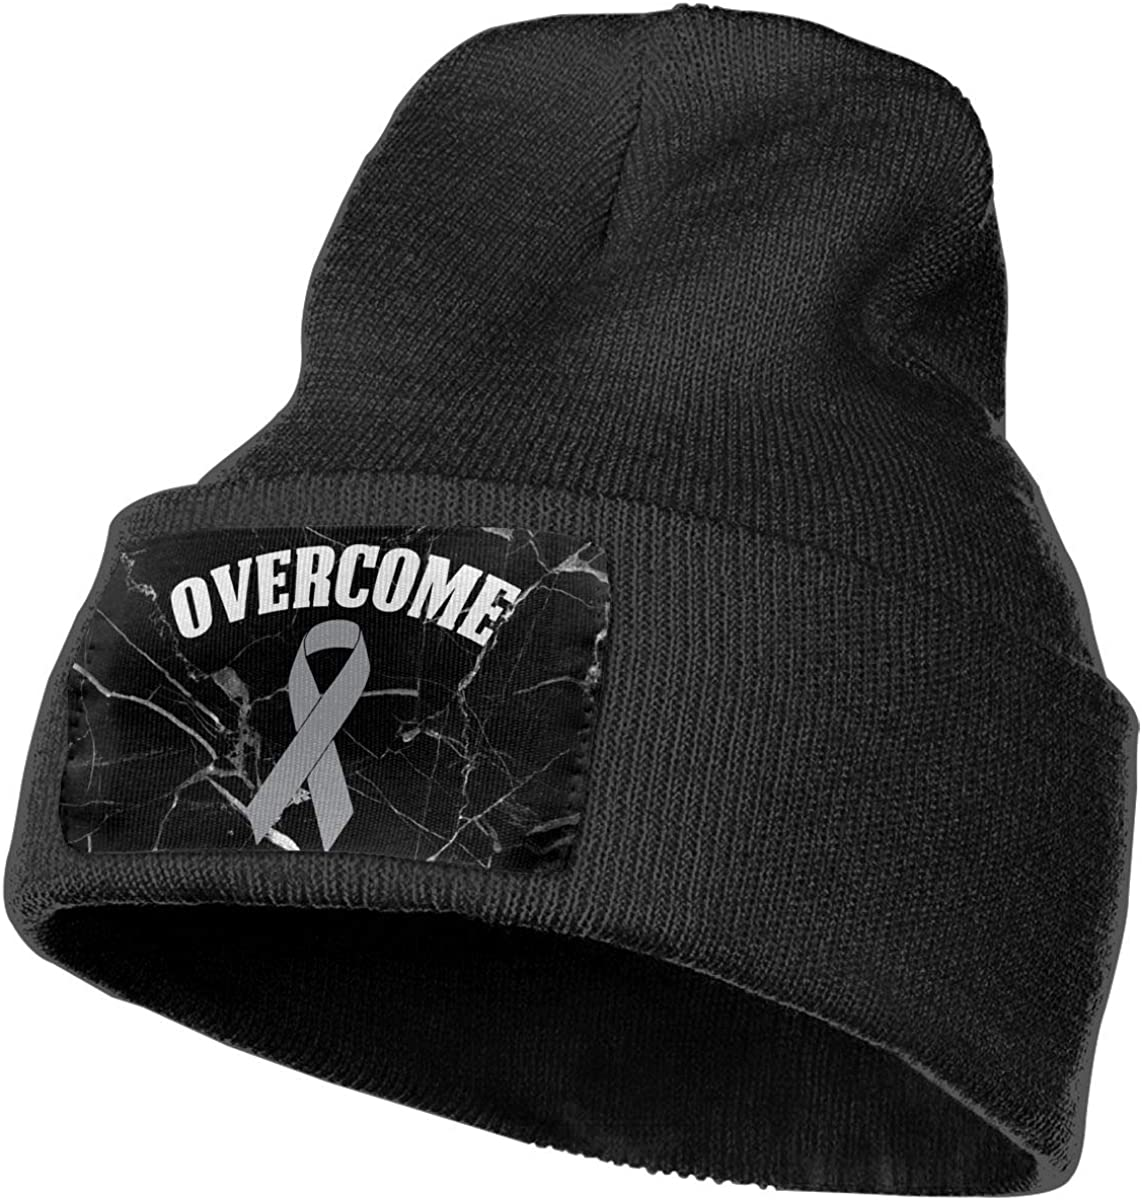 Overcome Brain Cancer Awareness Beanie Cap Hat Men Women Knitting Hats Stretchy /& Soft Beanie